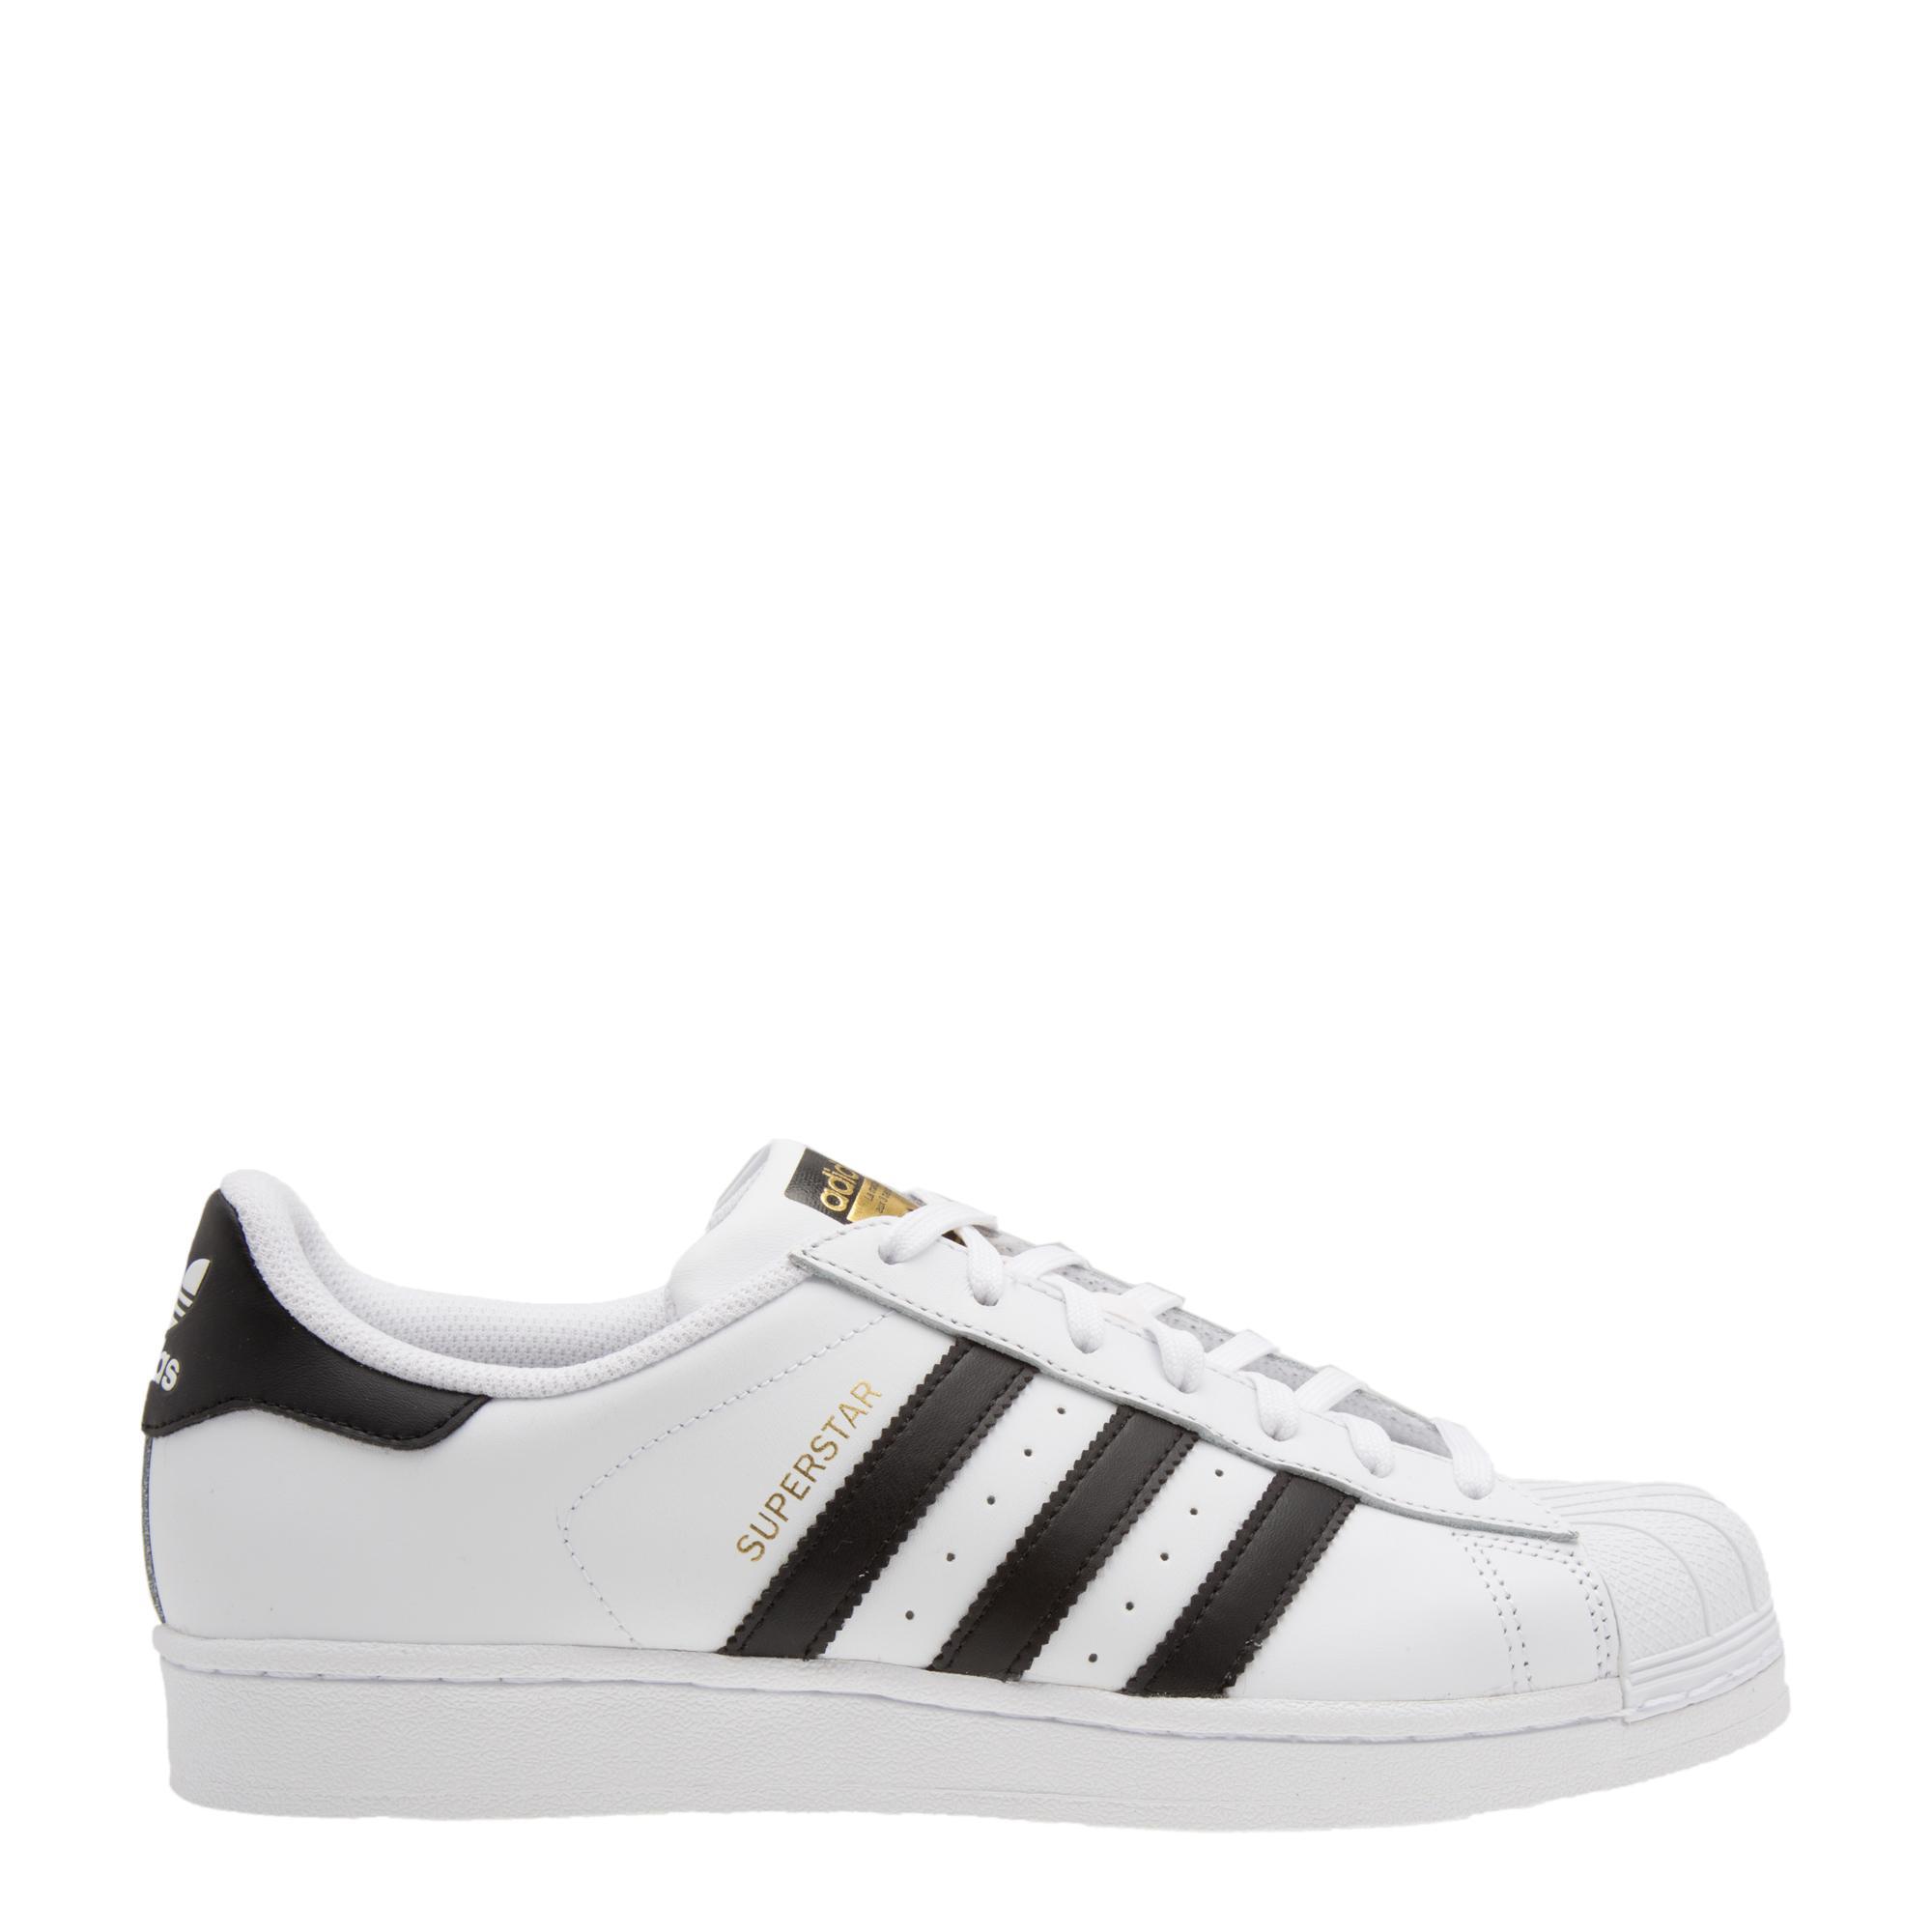 Classic Superstar sneakers